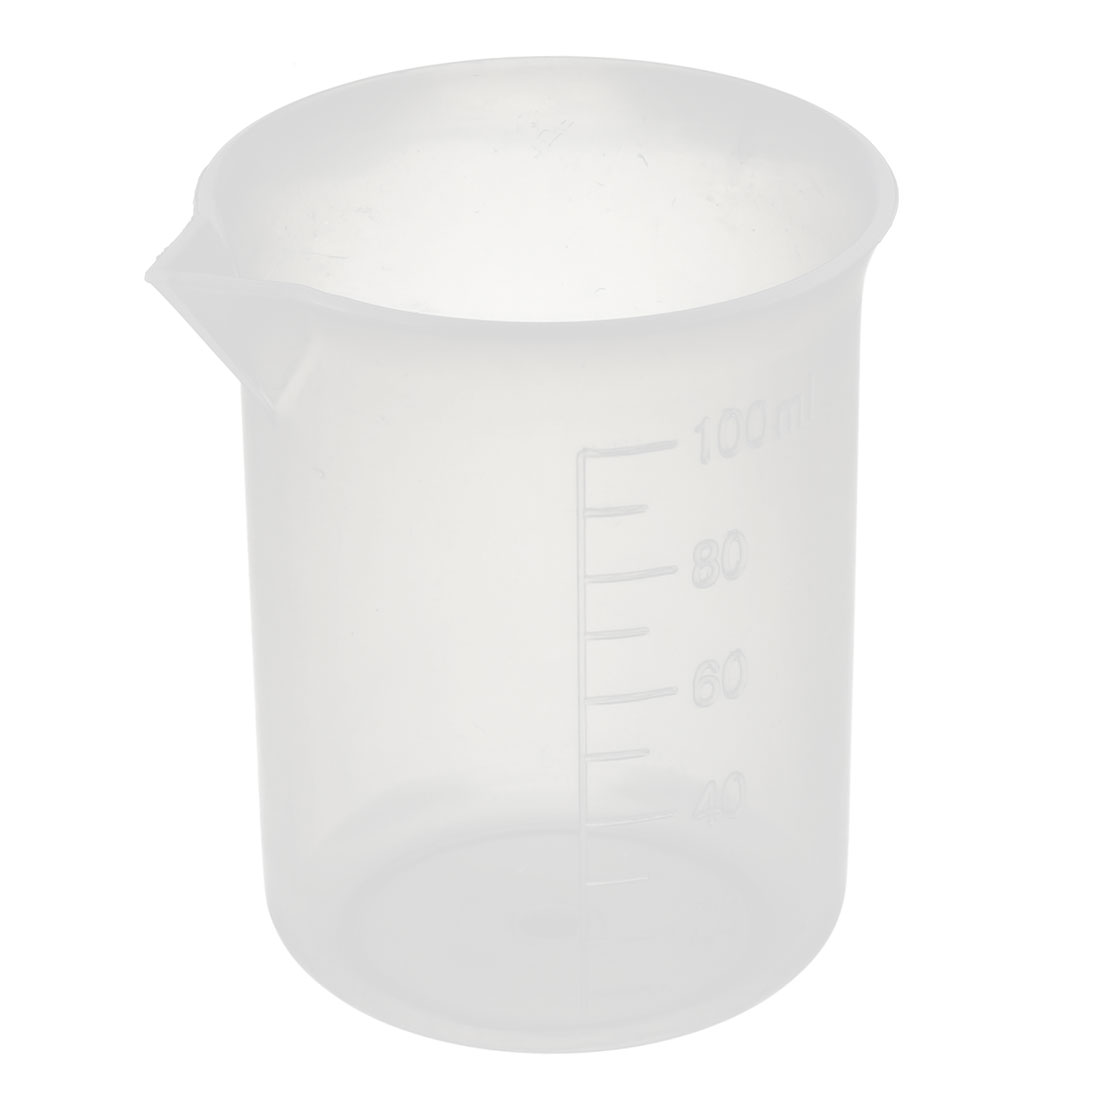 Lab 100mL Plastic Science Experiment Measuring Graduated Beaker Cup